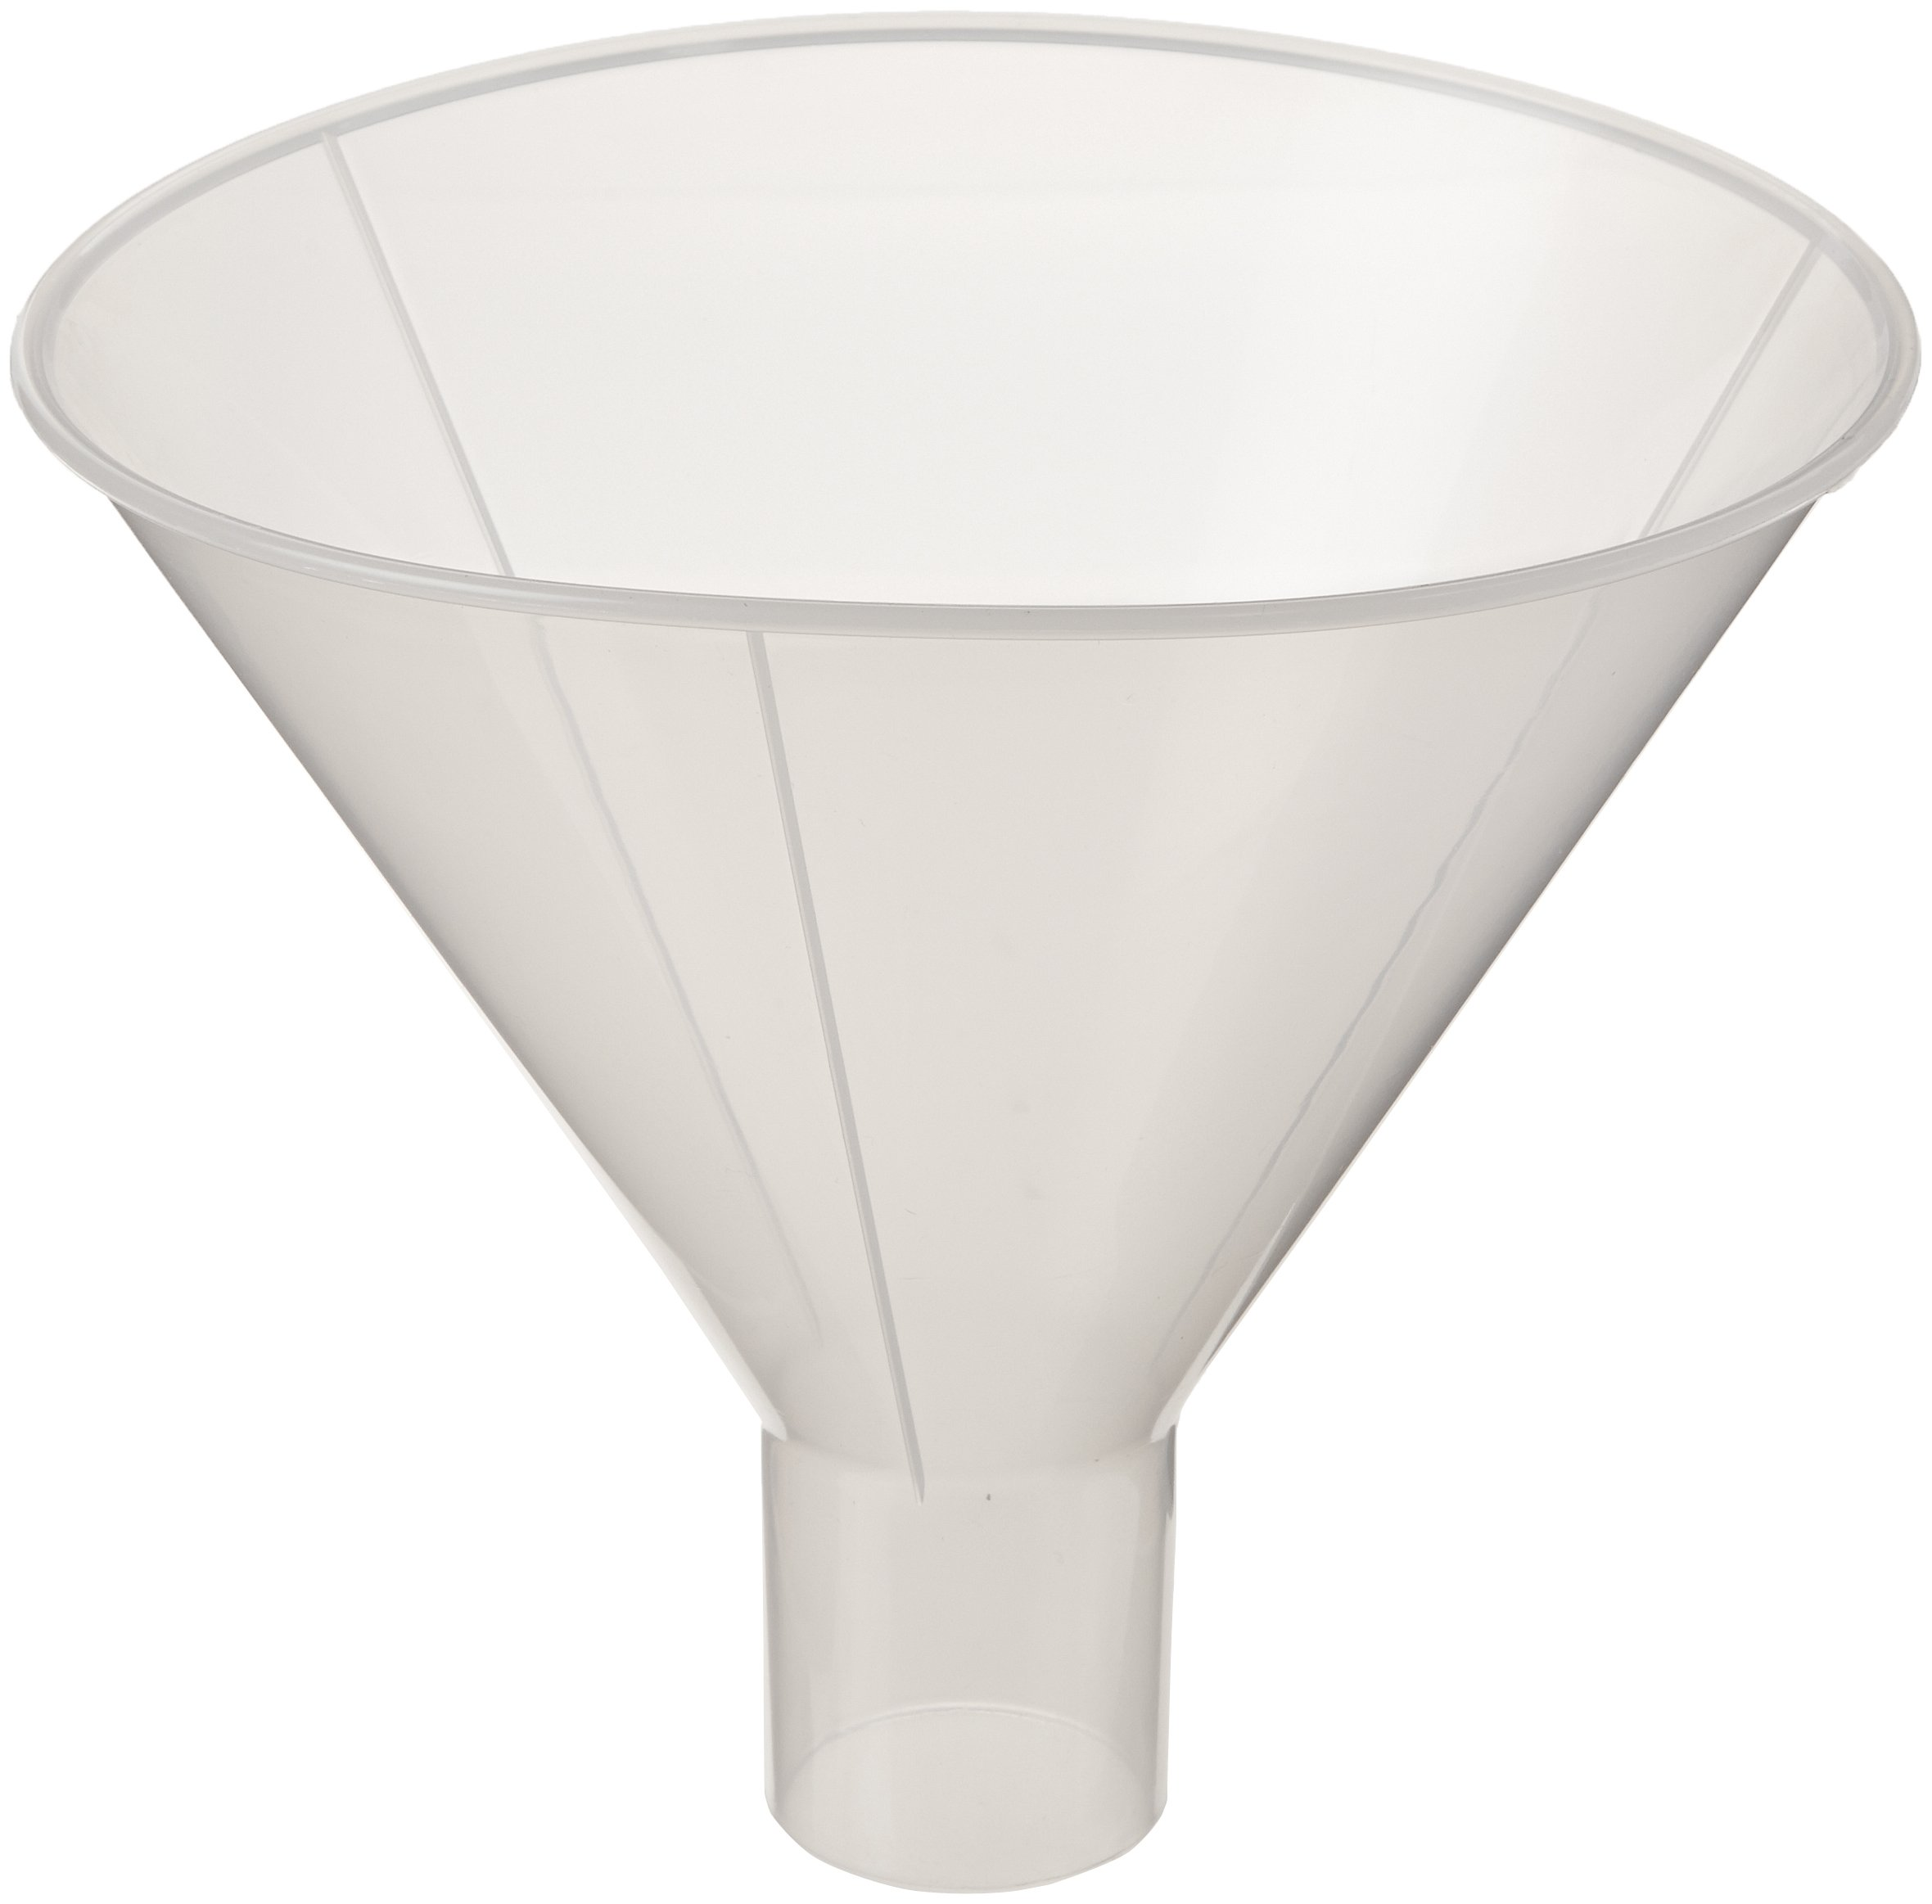 Globe Scientific 600166-1 Polypropylene Powder Funnel, 180mm Funnel Size, 180mm Top Diameter by Globe Scientific